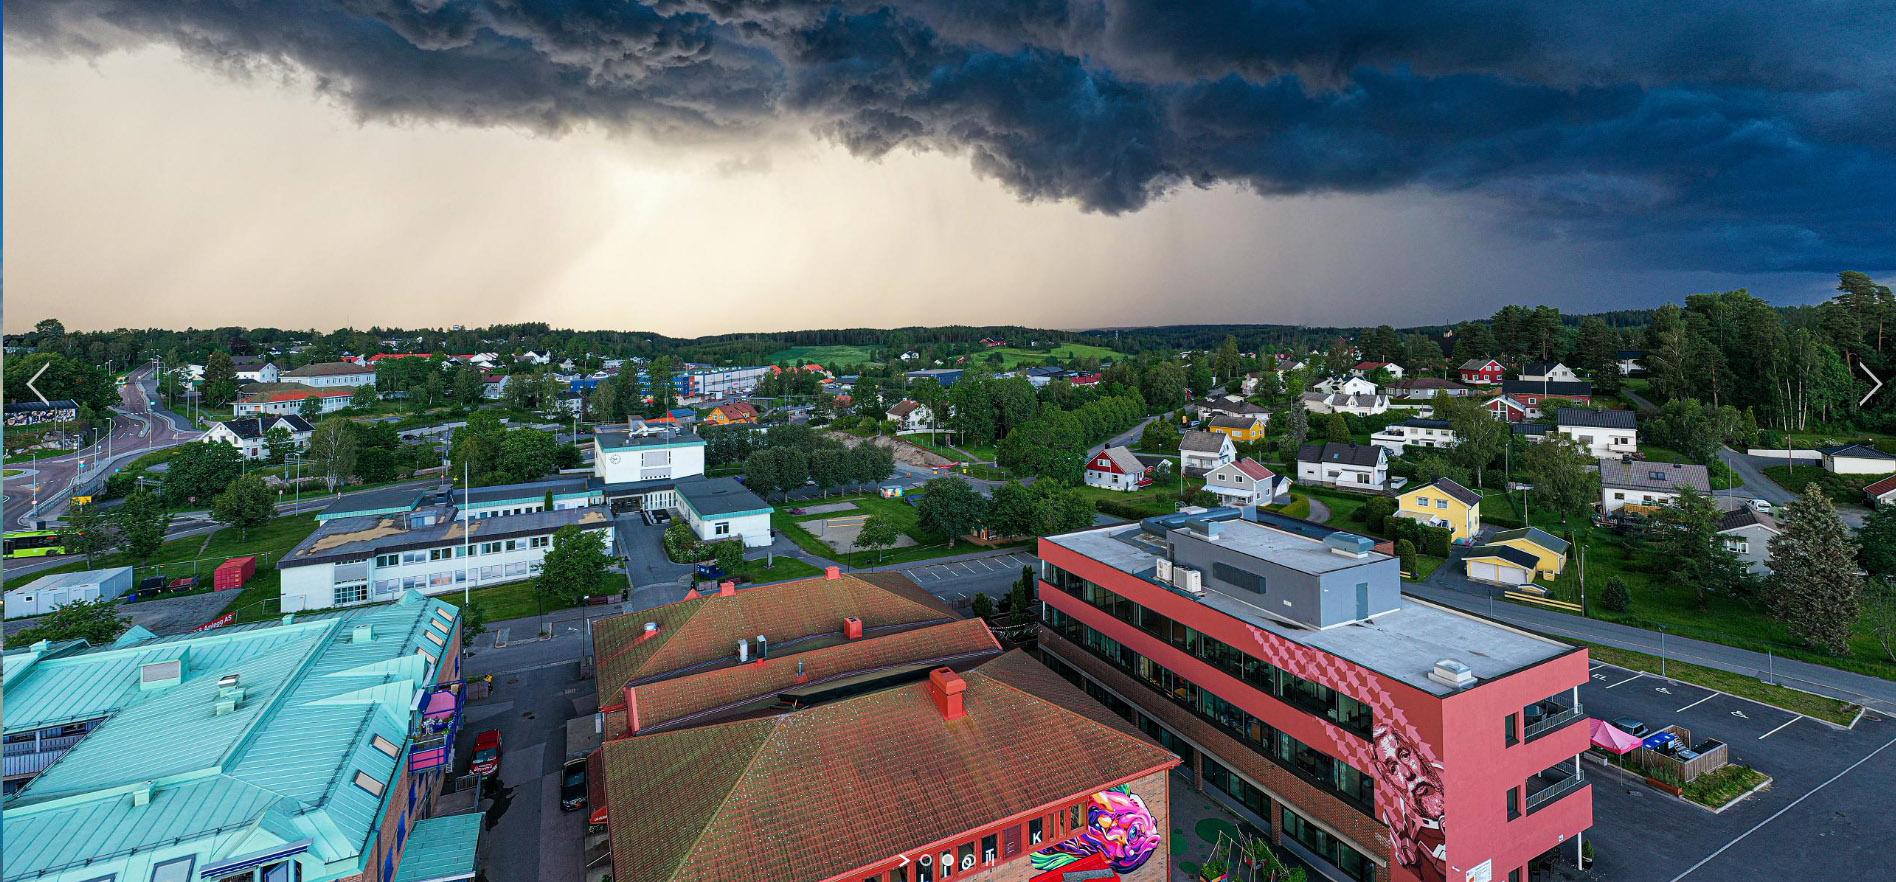 Follo Dronefoto tatt bilde i Vestby Sentrum